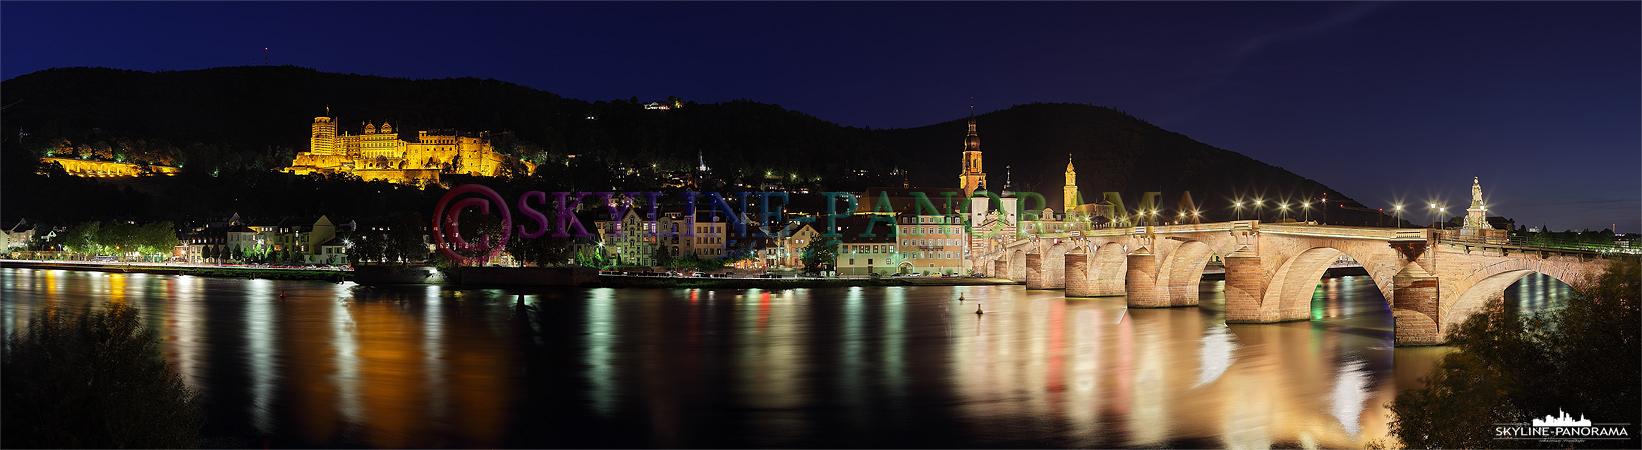 Bilder Heidelberg